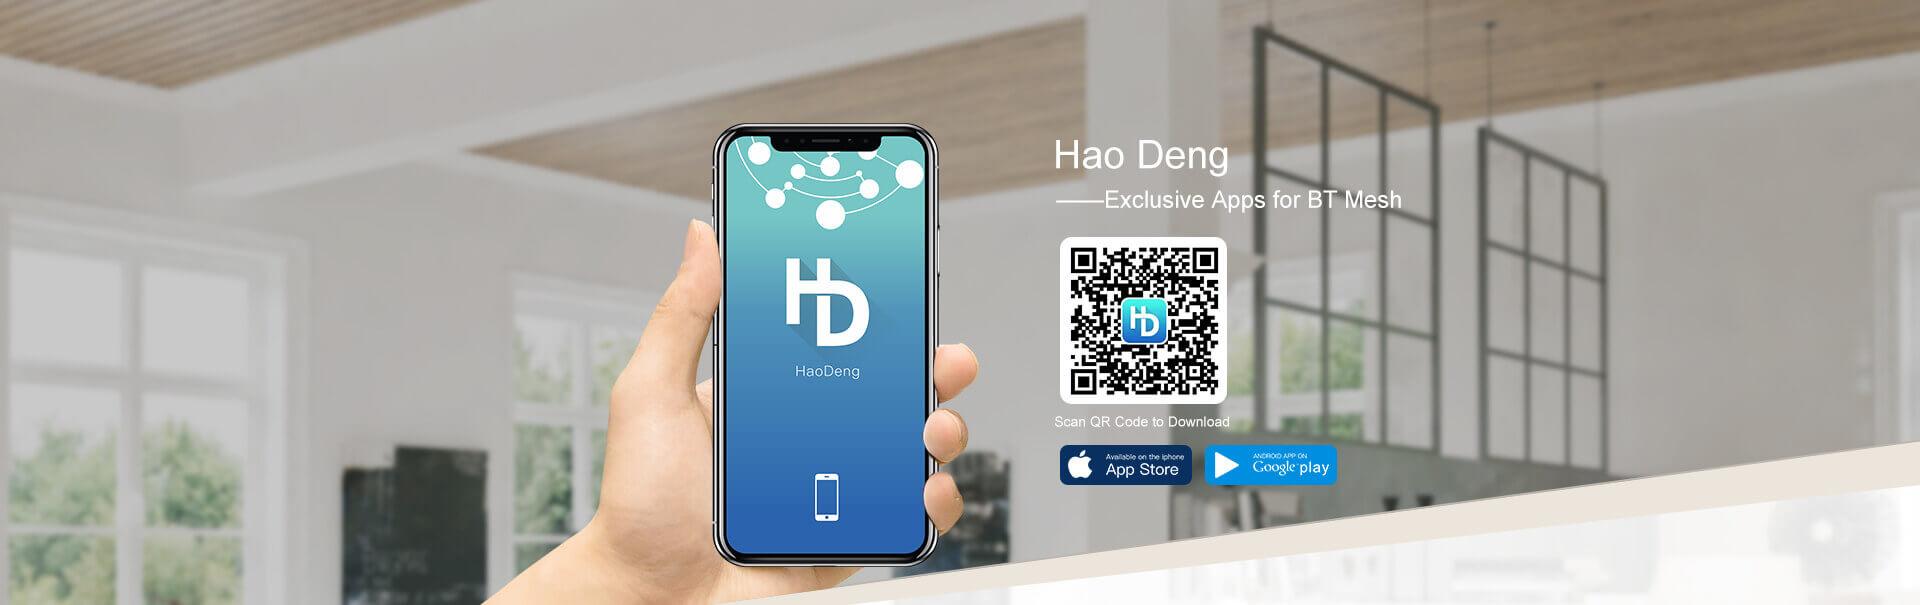 HaoDeng App